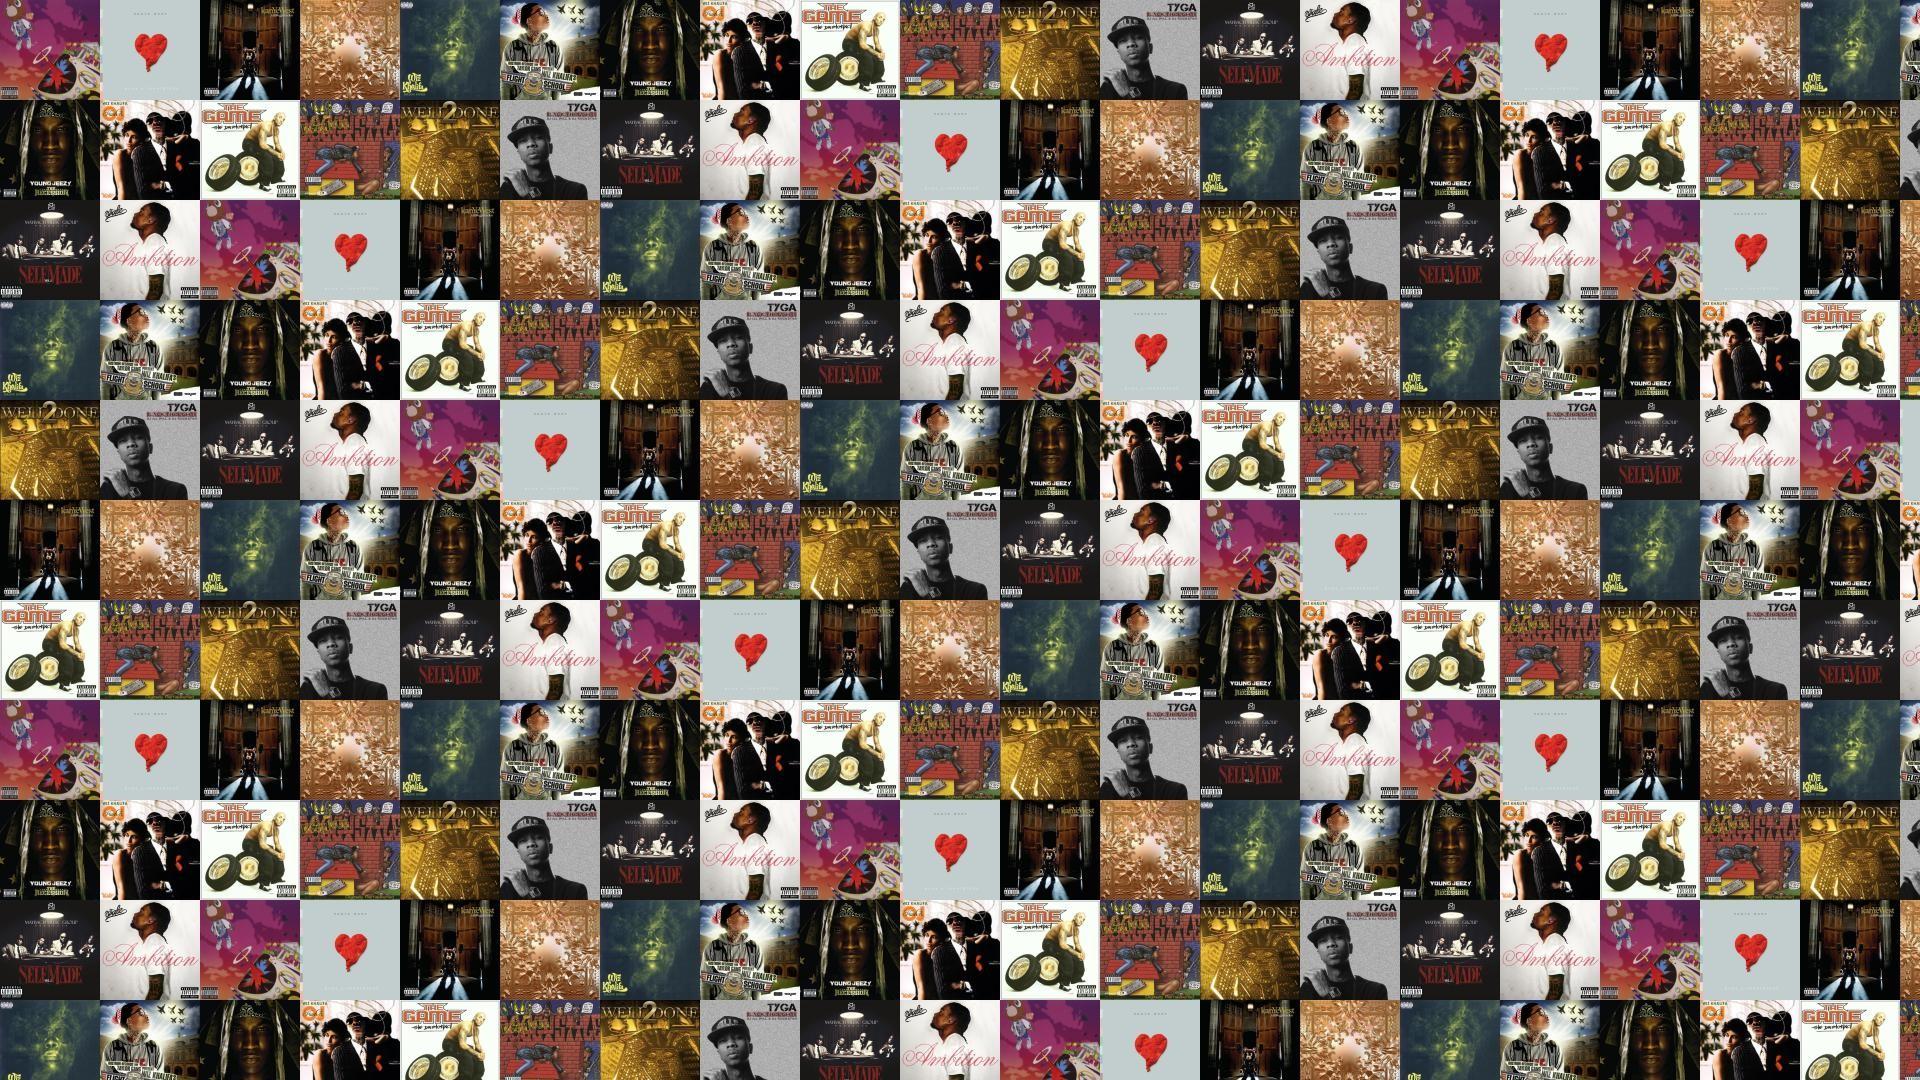 Kanye West Graduation 808s Heartbreaks Kanye West Wallpaper Â« Tiled Desktop  Wallpaper